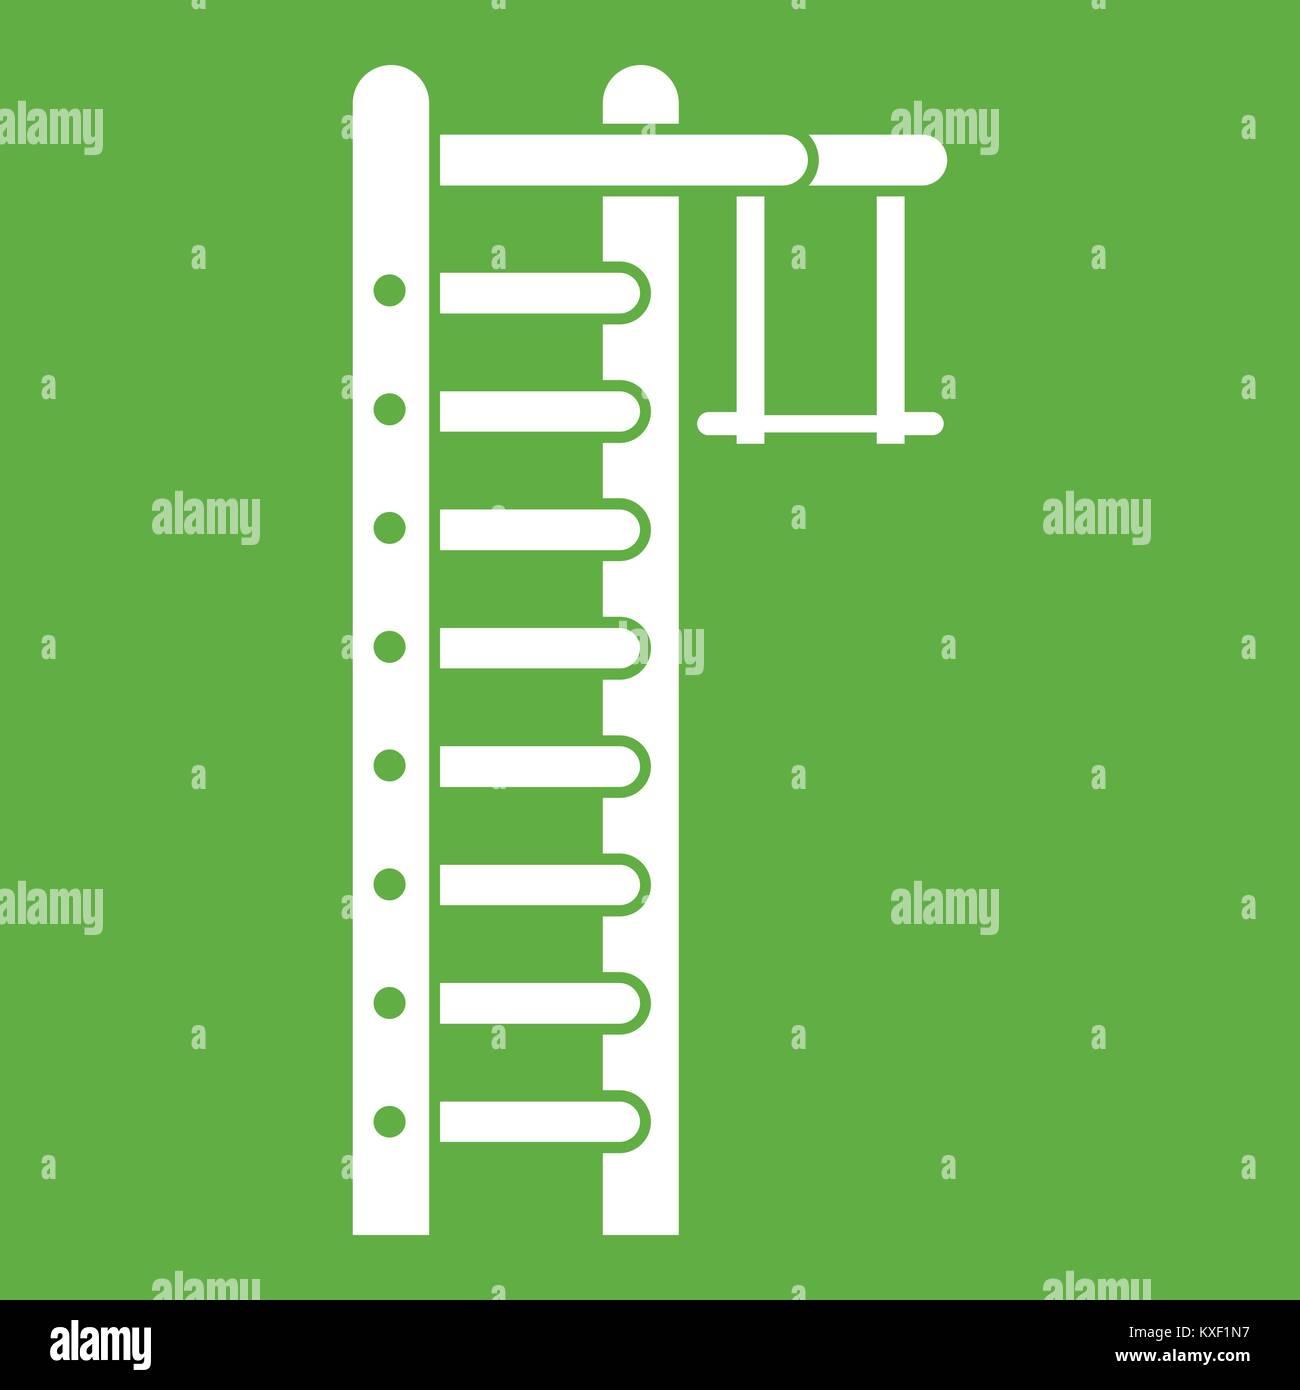 Swedish ladder icon green - Stock Image